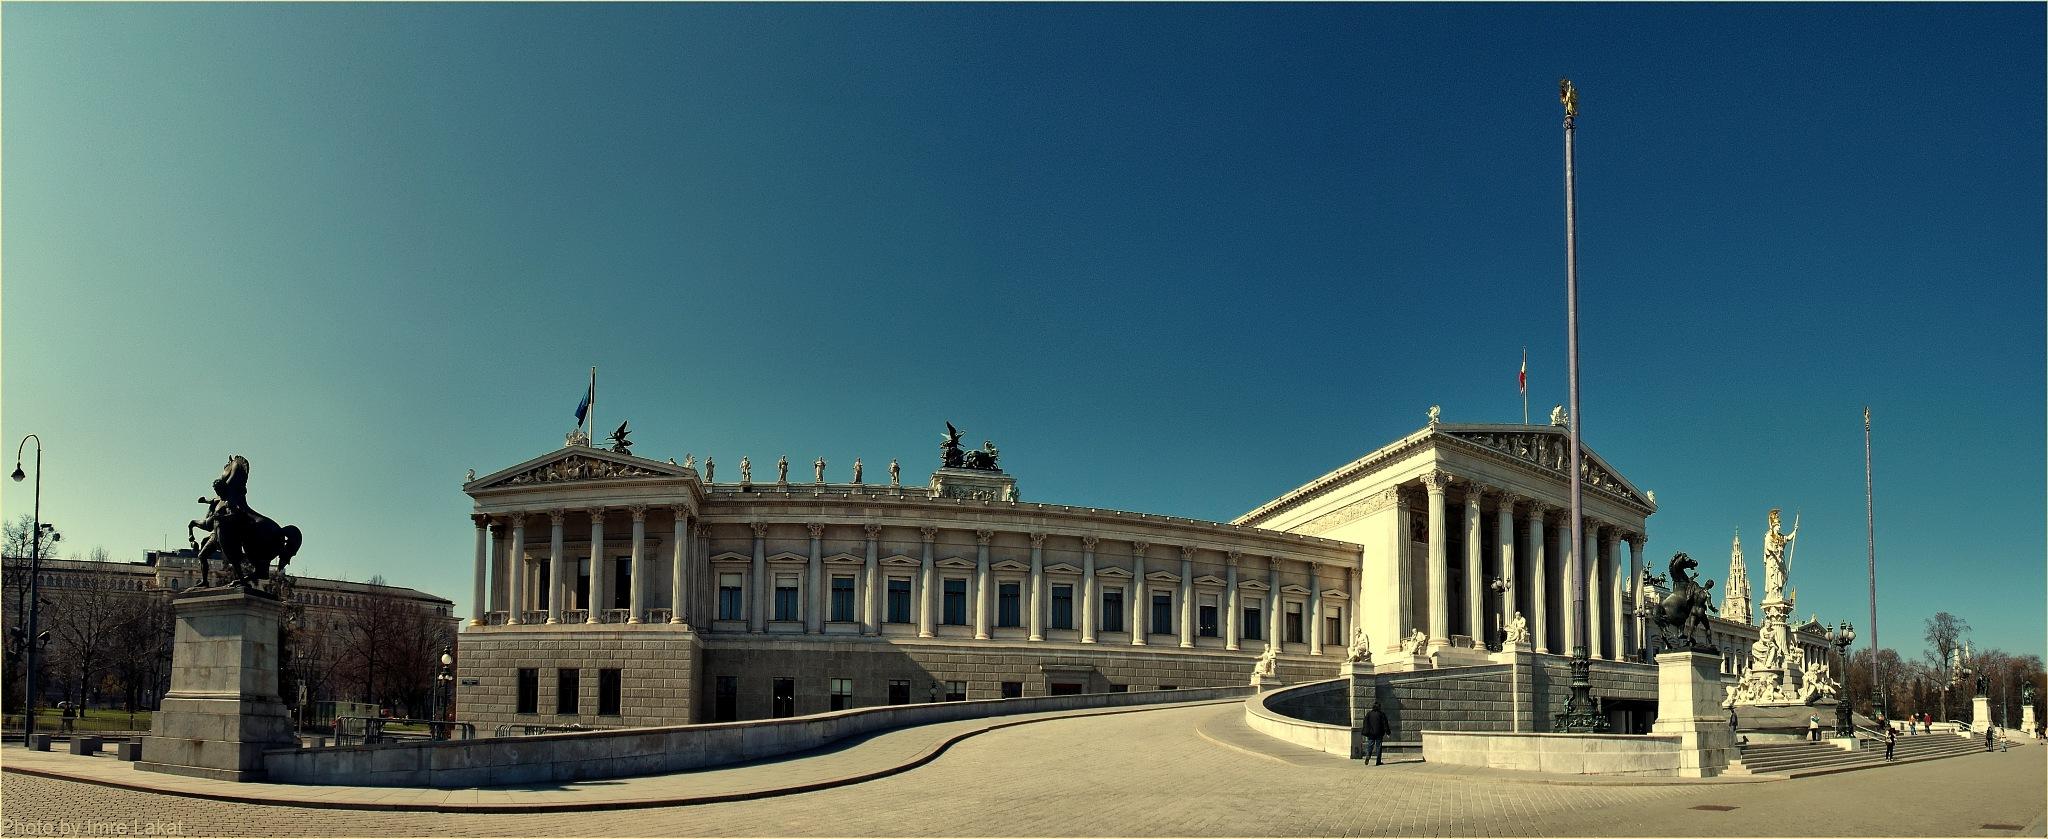 Austrian Parliament Building, Dr.-Karl-Renner-Ring, Vienna, Ausztria by Imre Lakat